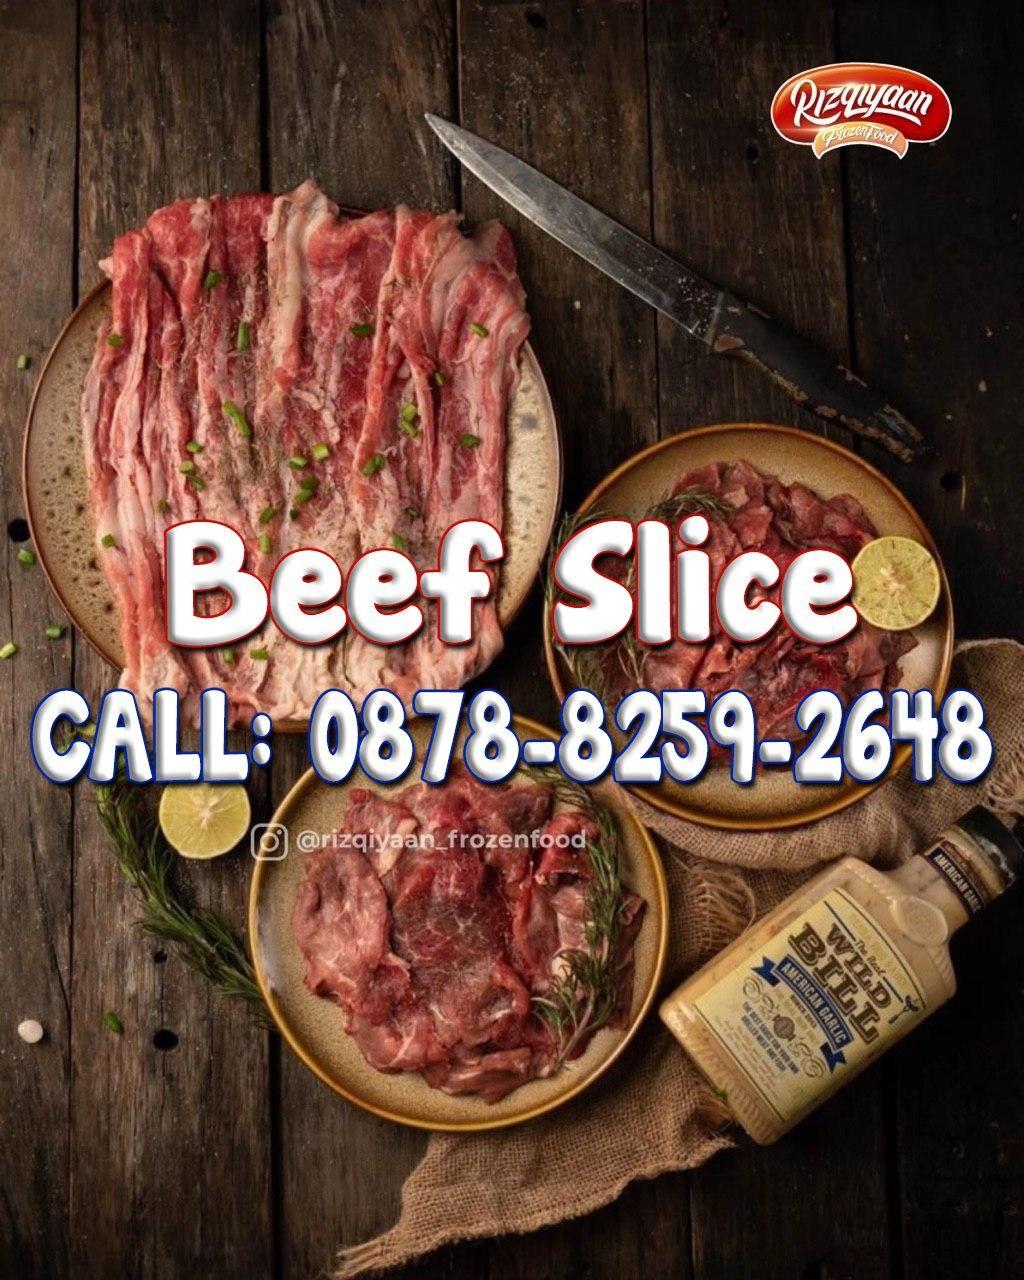 Special Call 0878 8259 2648 Jual Daging Kebab Candi Sidoarjo Jual Daging Steak Wagyu Sidoarjo Jual Daging Saikoro Si Daging Sapi Cincang Kebab Daging Sapi